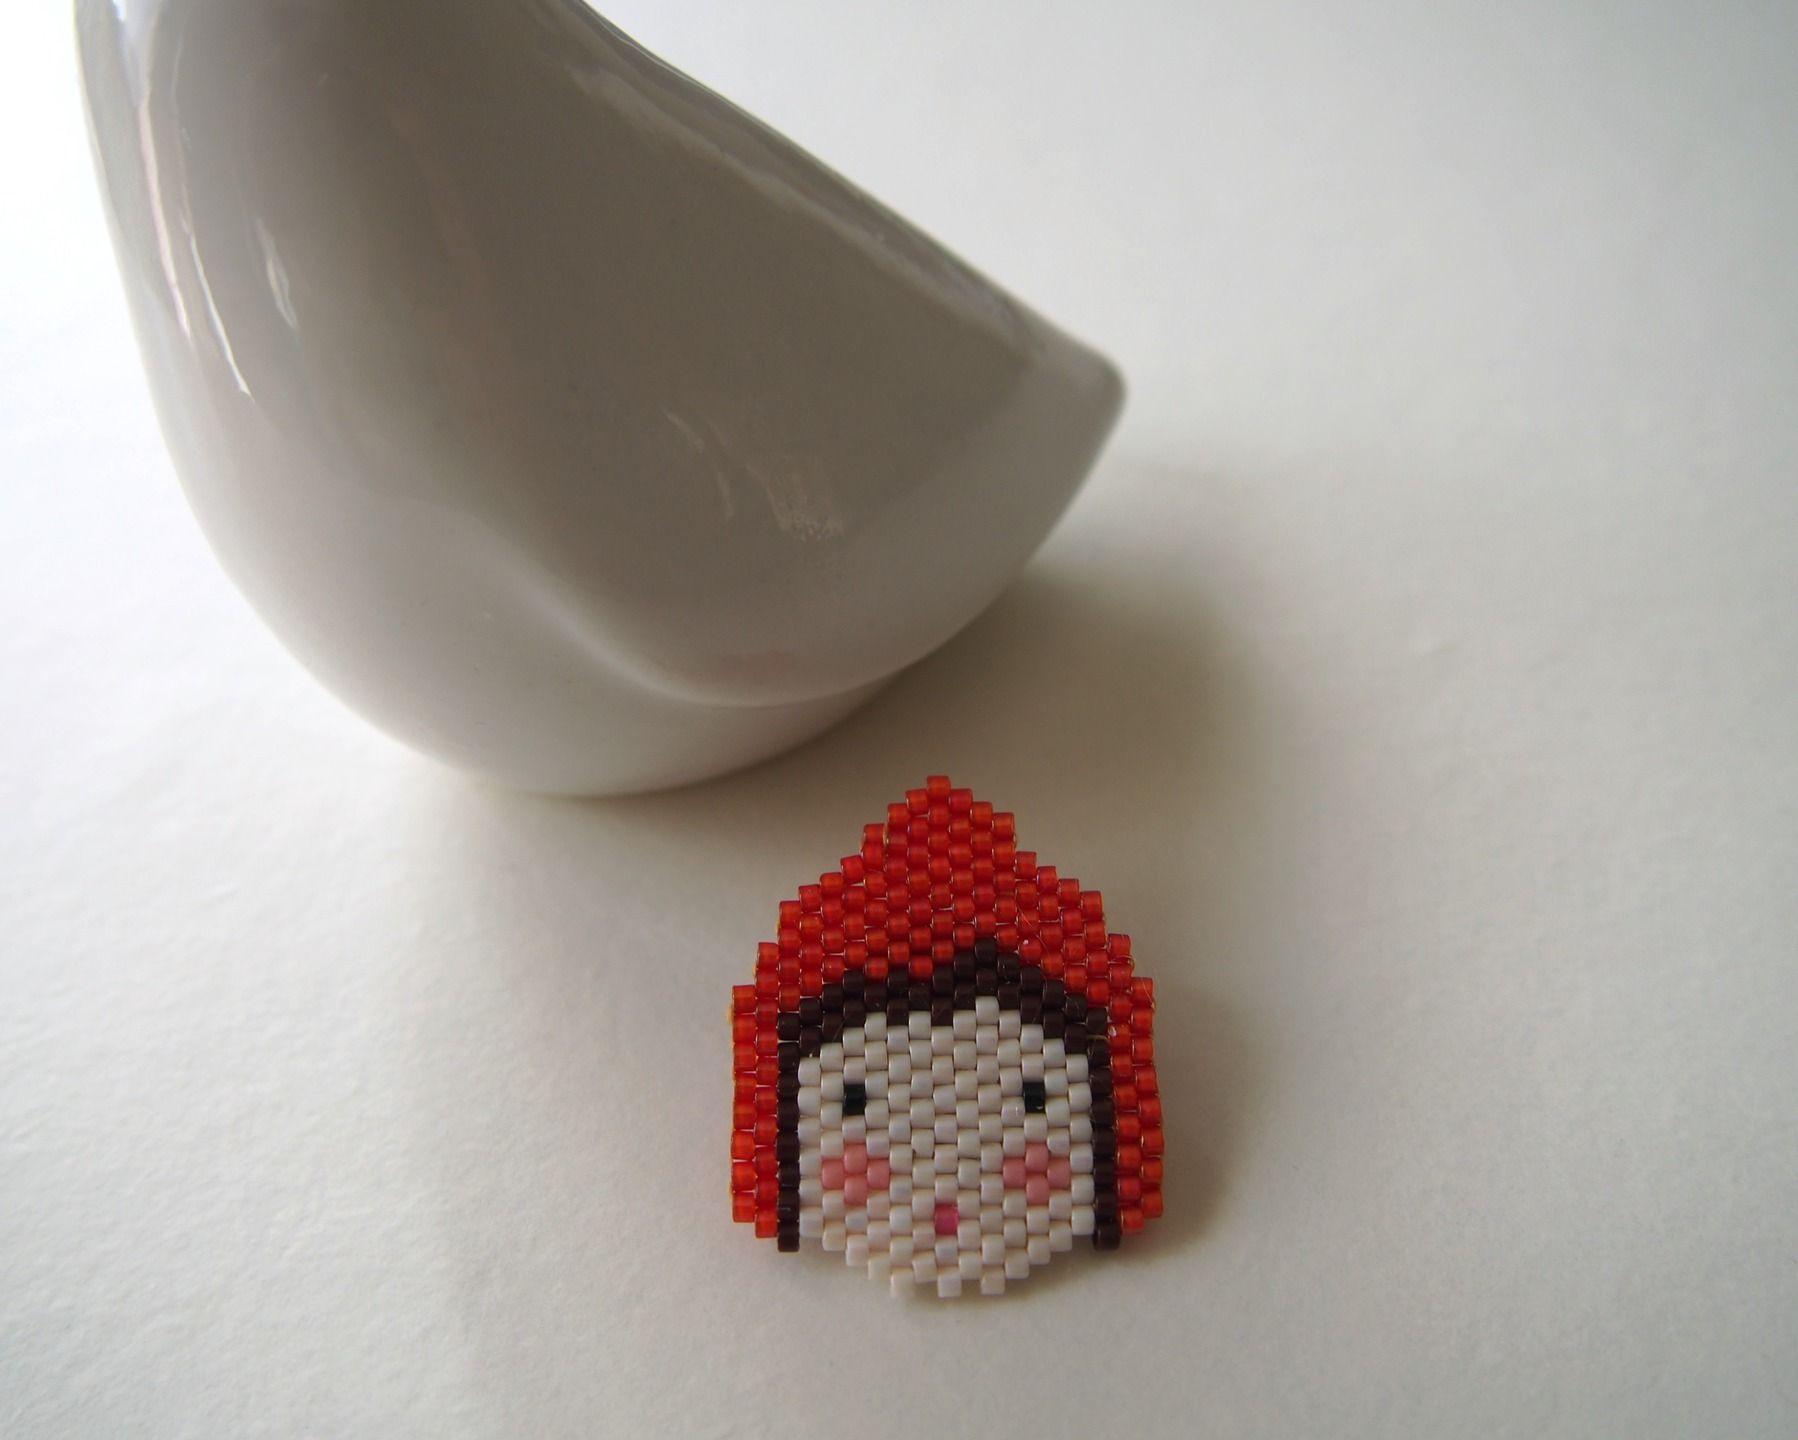 Broche Petit Chaperon rouge tissée en perles Miyuki : Broche par lili-azalee-bijoux